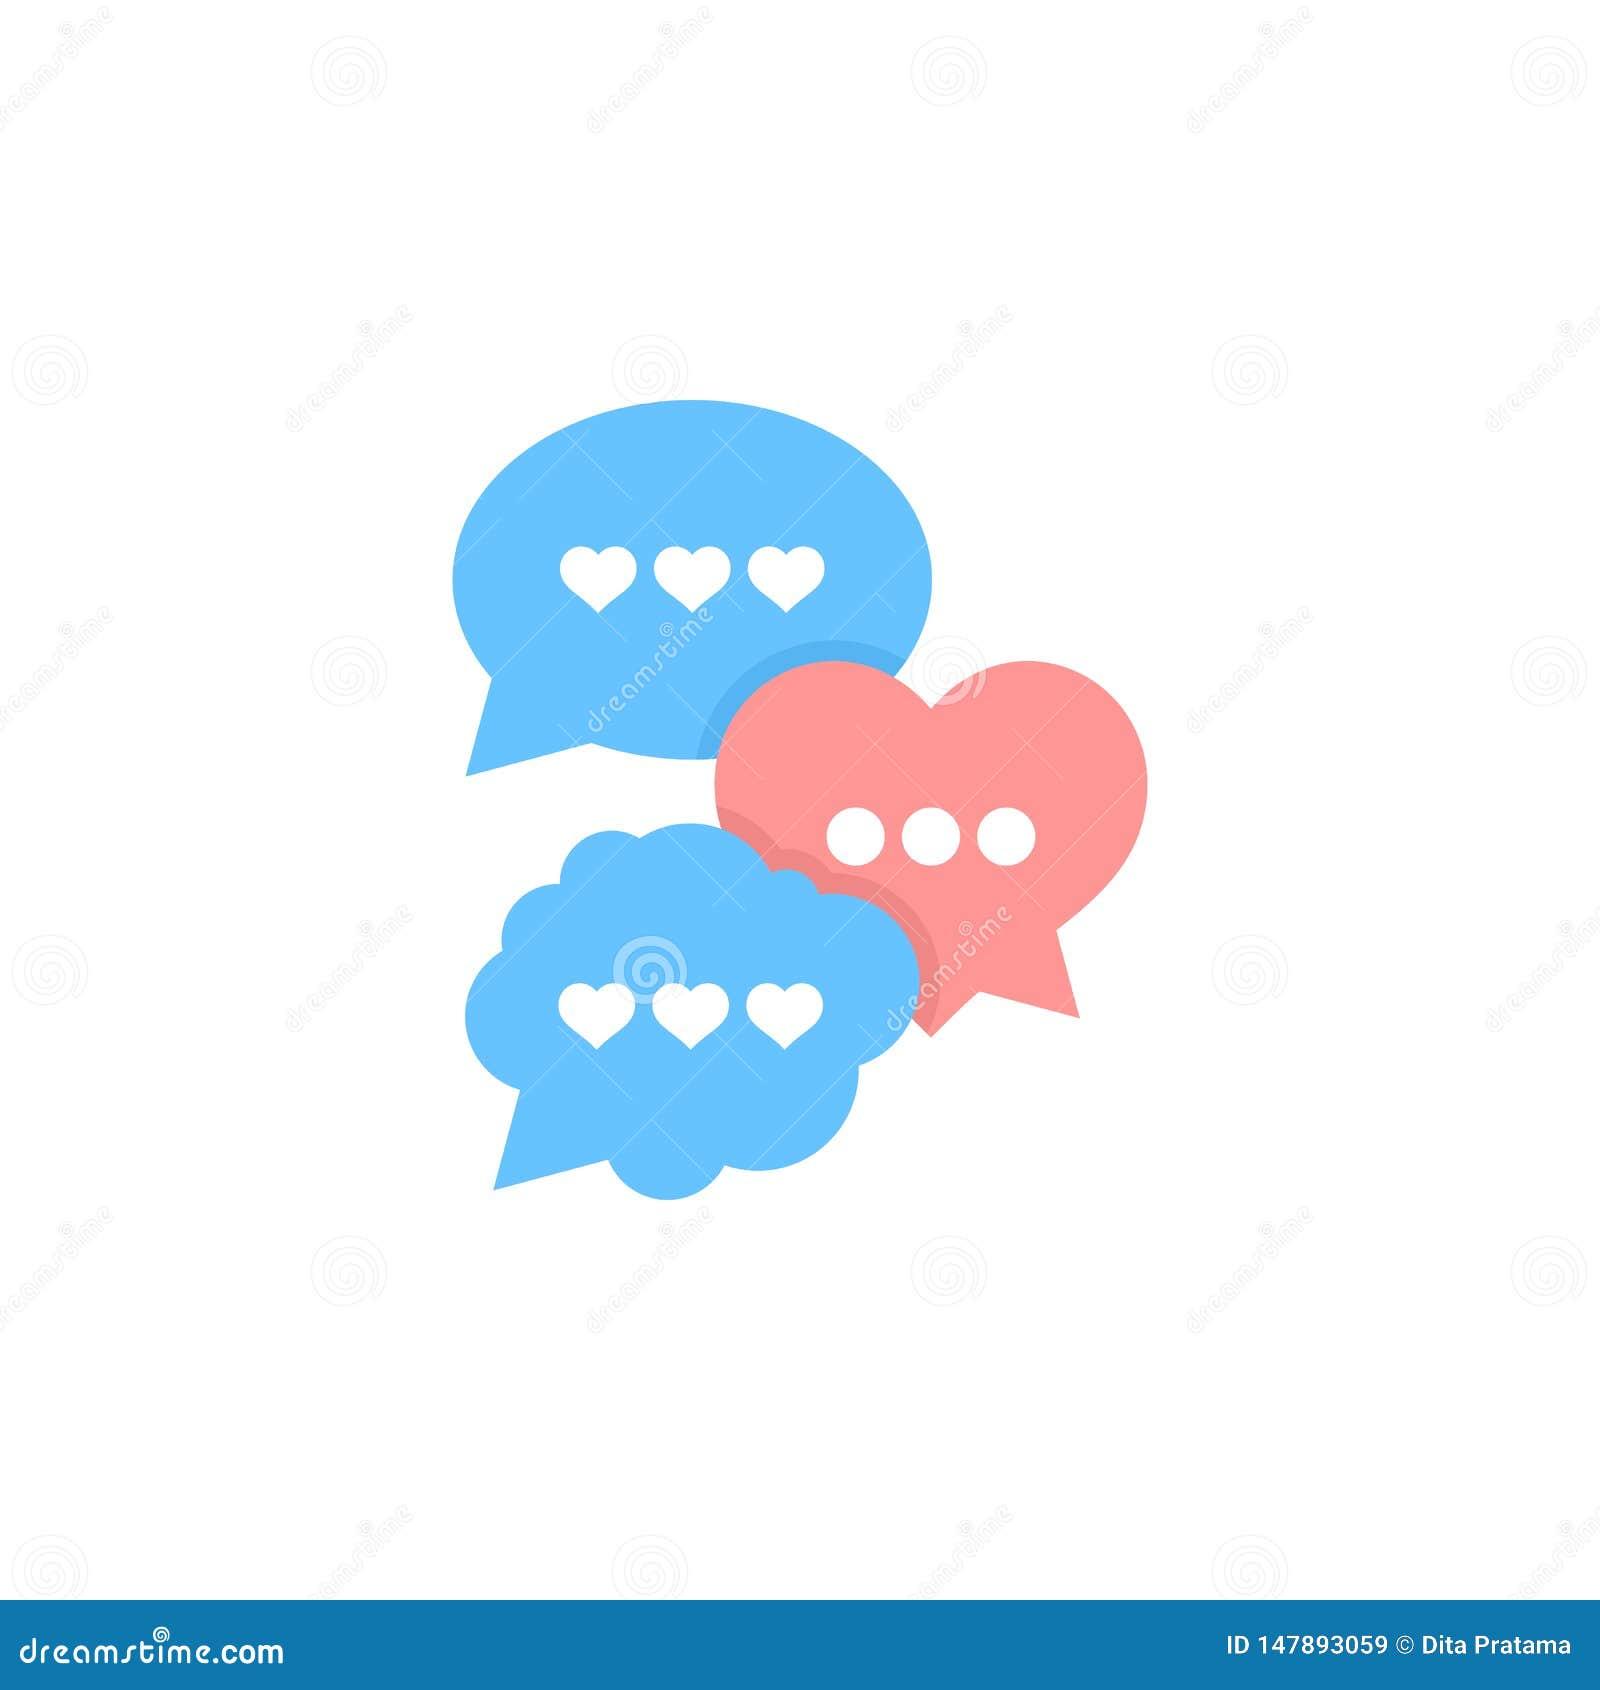 Talking about love, bubble speech vector illustration.